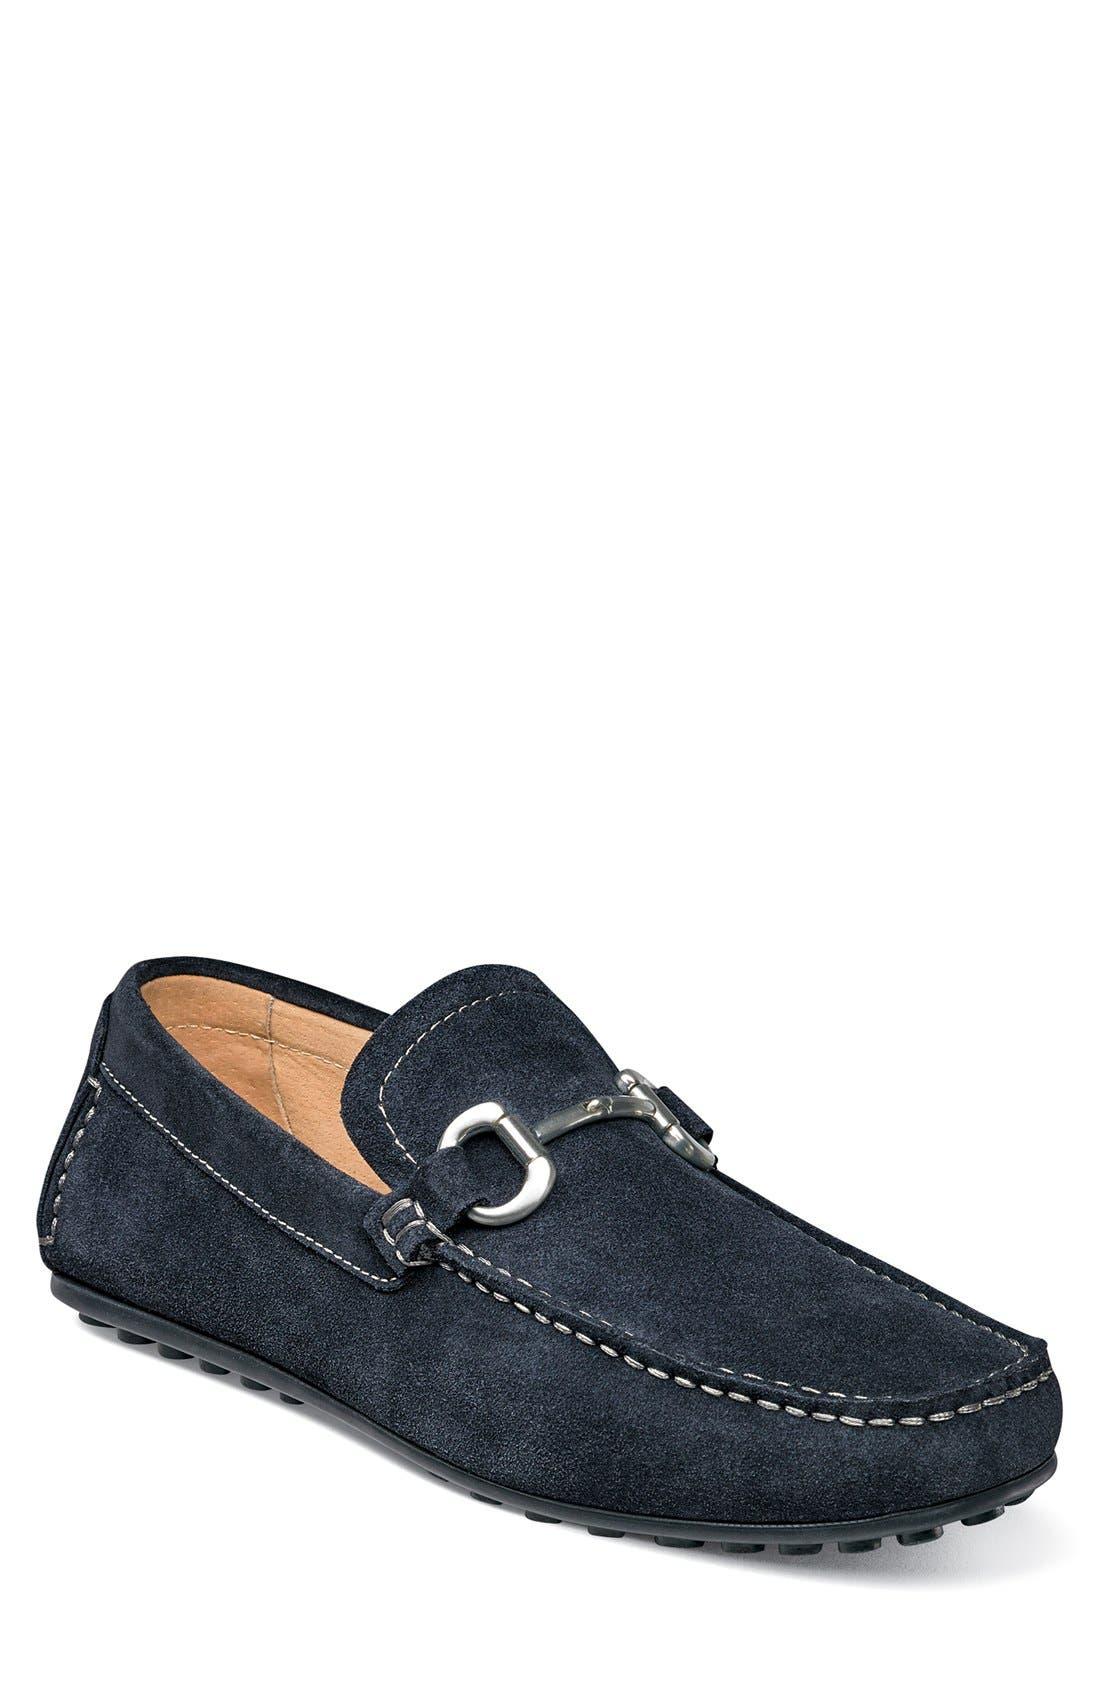 'Danforth' Driving Shoe,                         Main,                         color, NAVY SUEDE